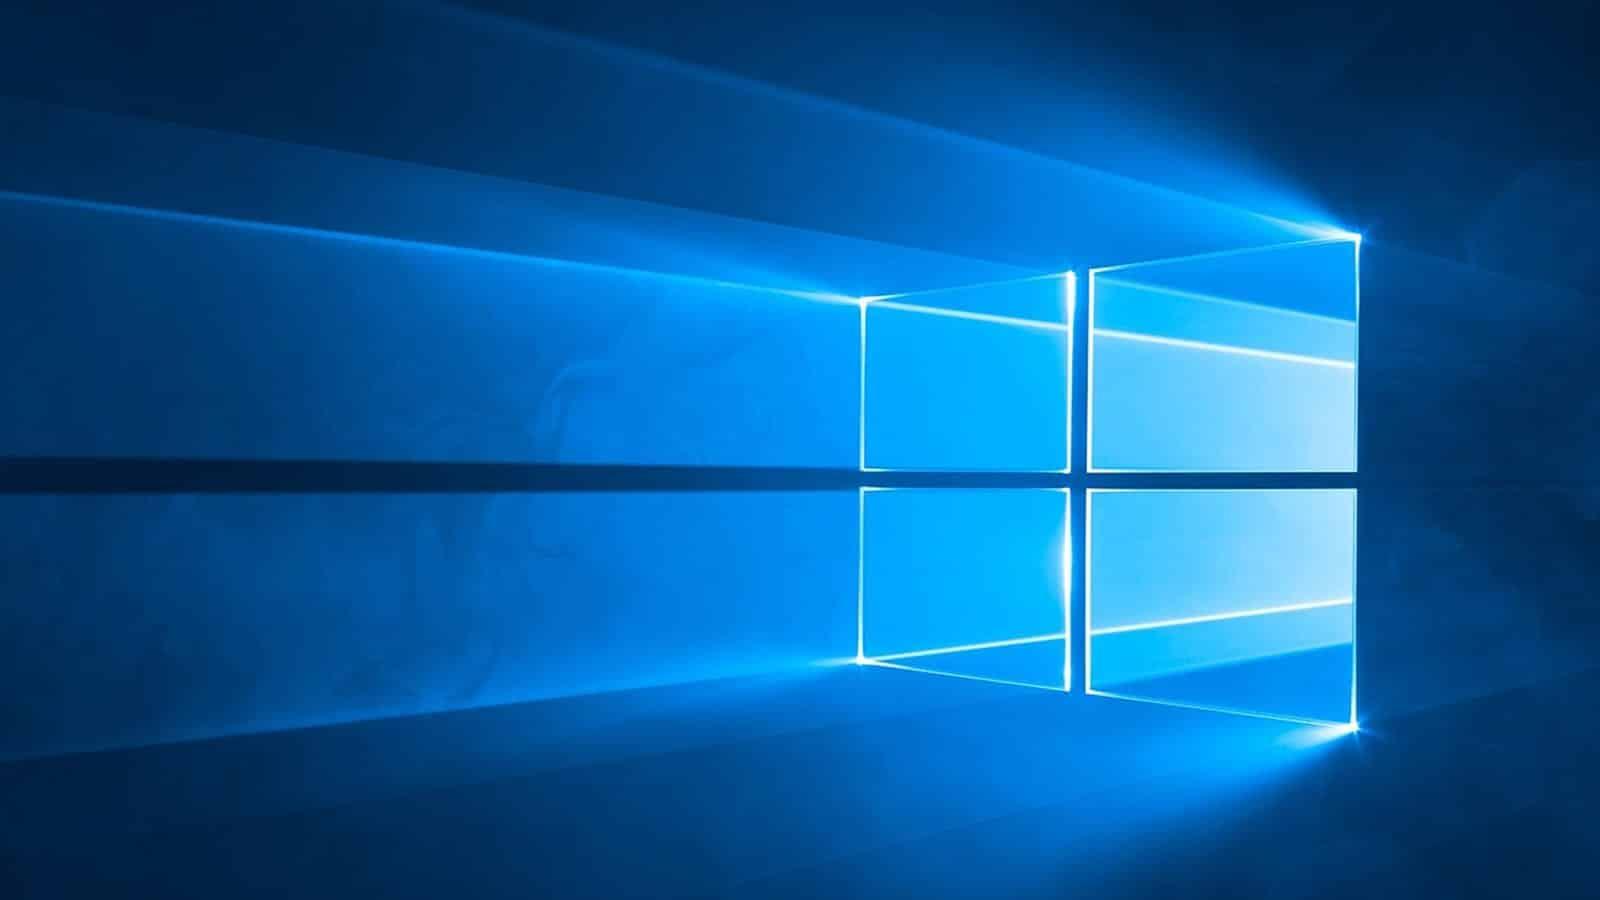 Windows 10 October Update Issues